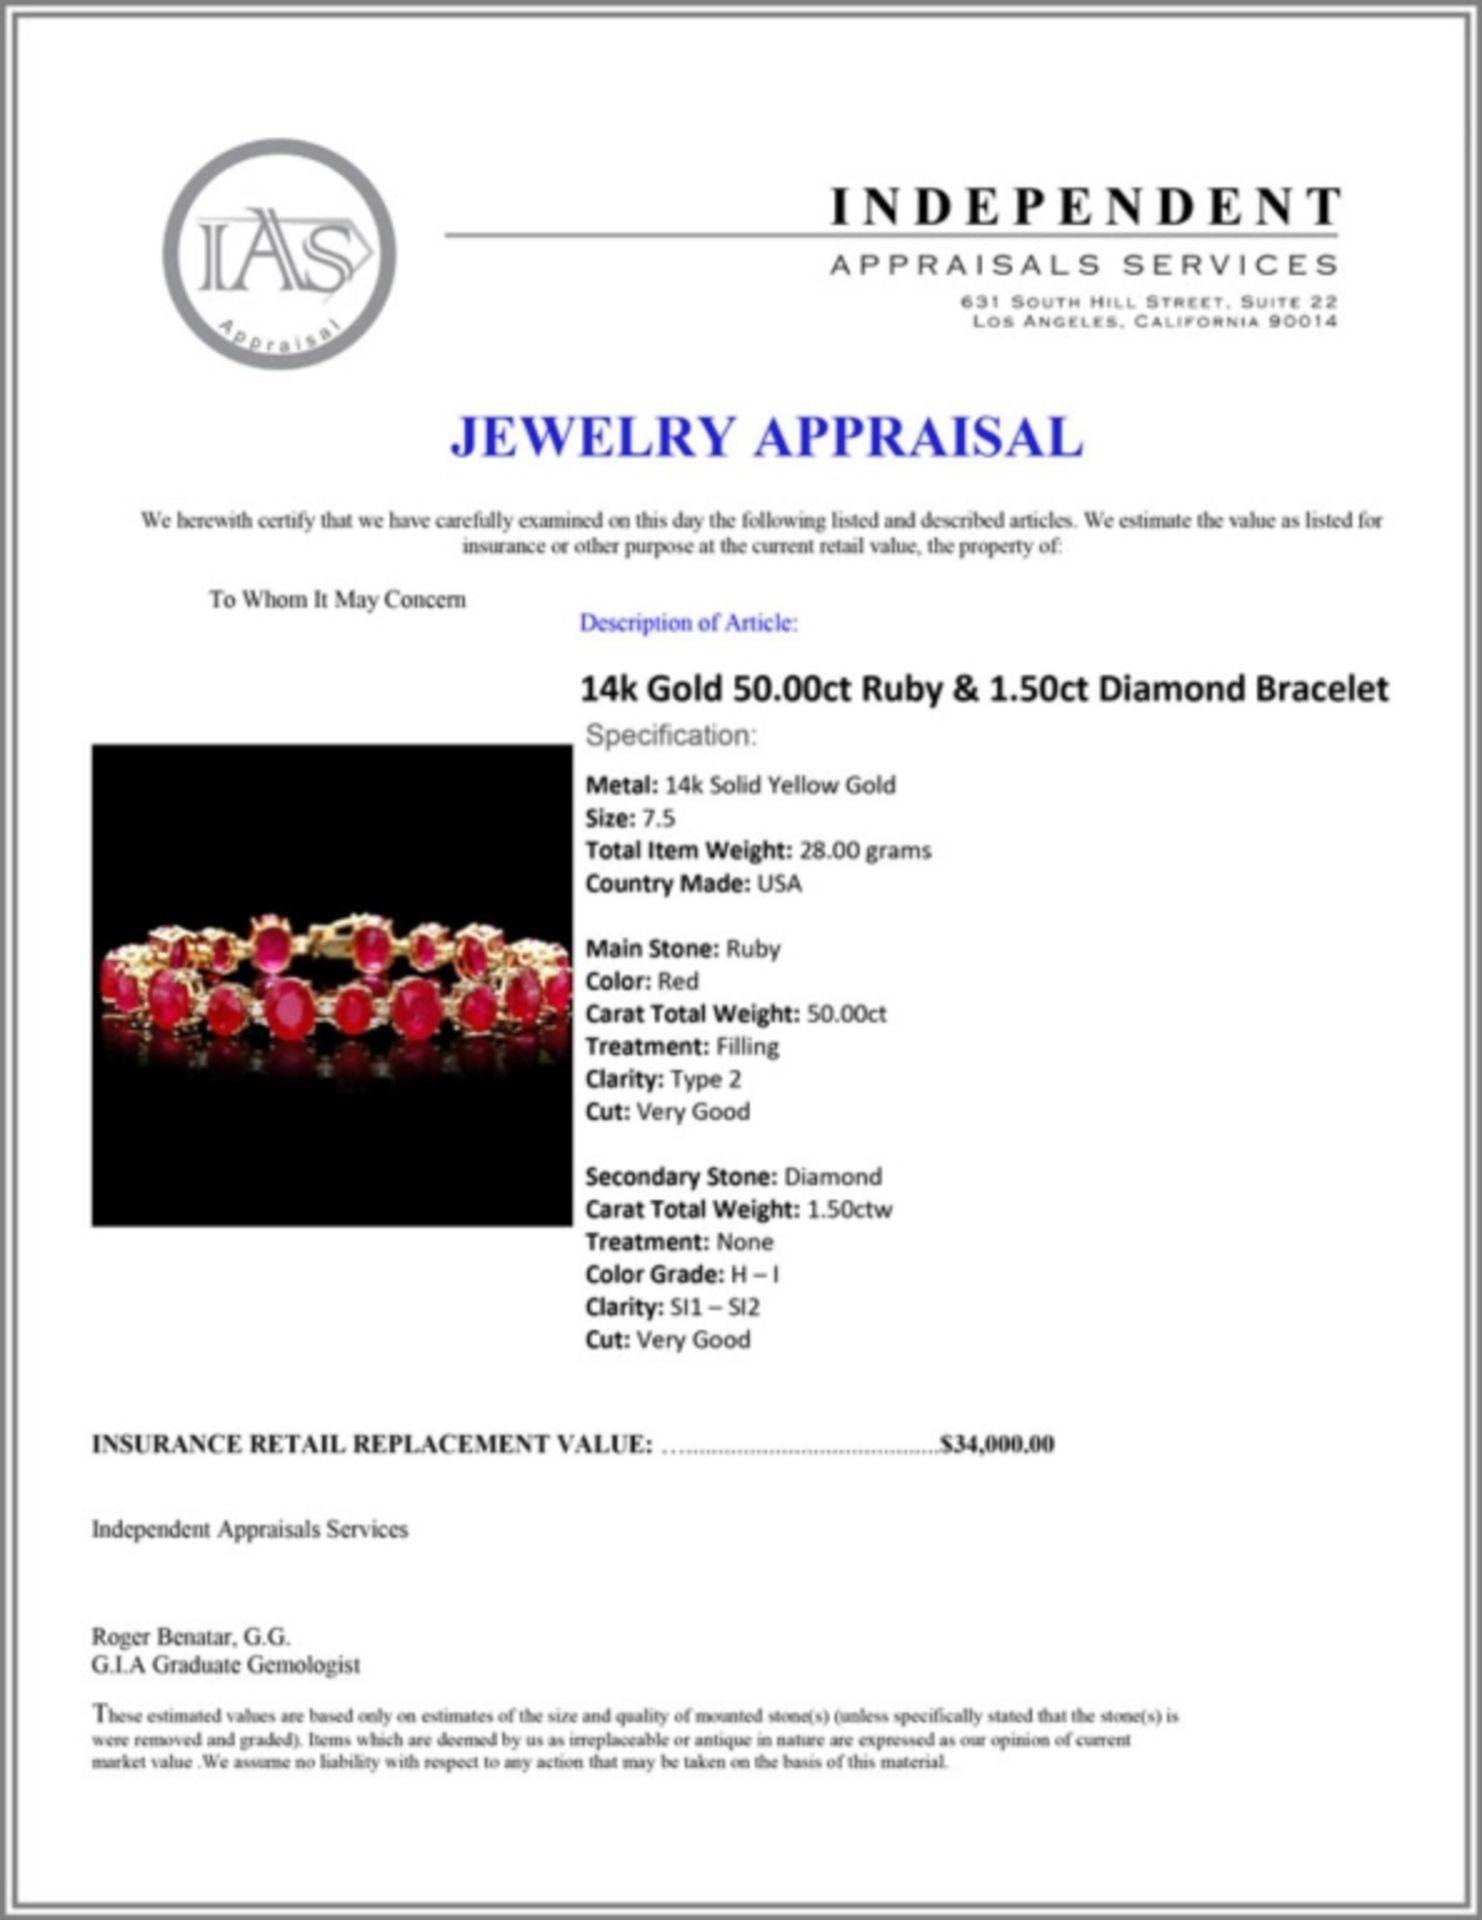 `14k Gold 50.00ct Ruby & 1.50ct Diamond Bracelet - Image 3 of 3